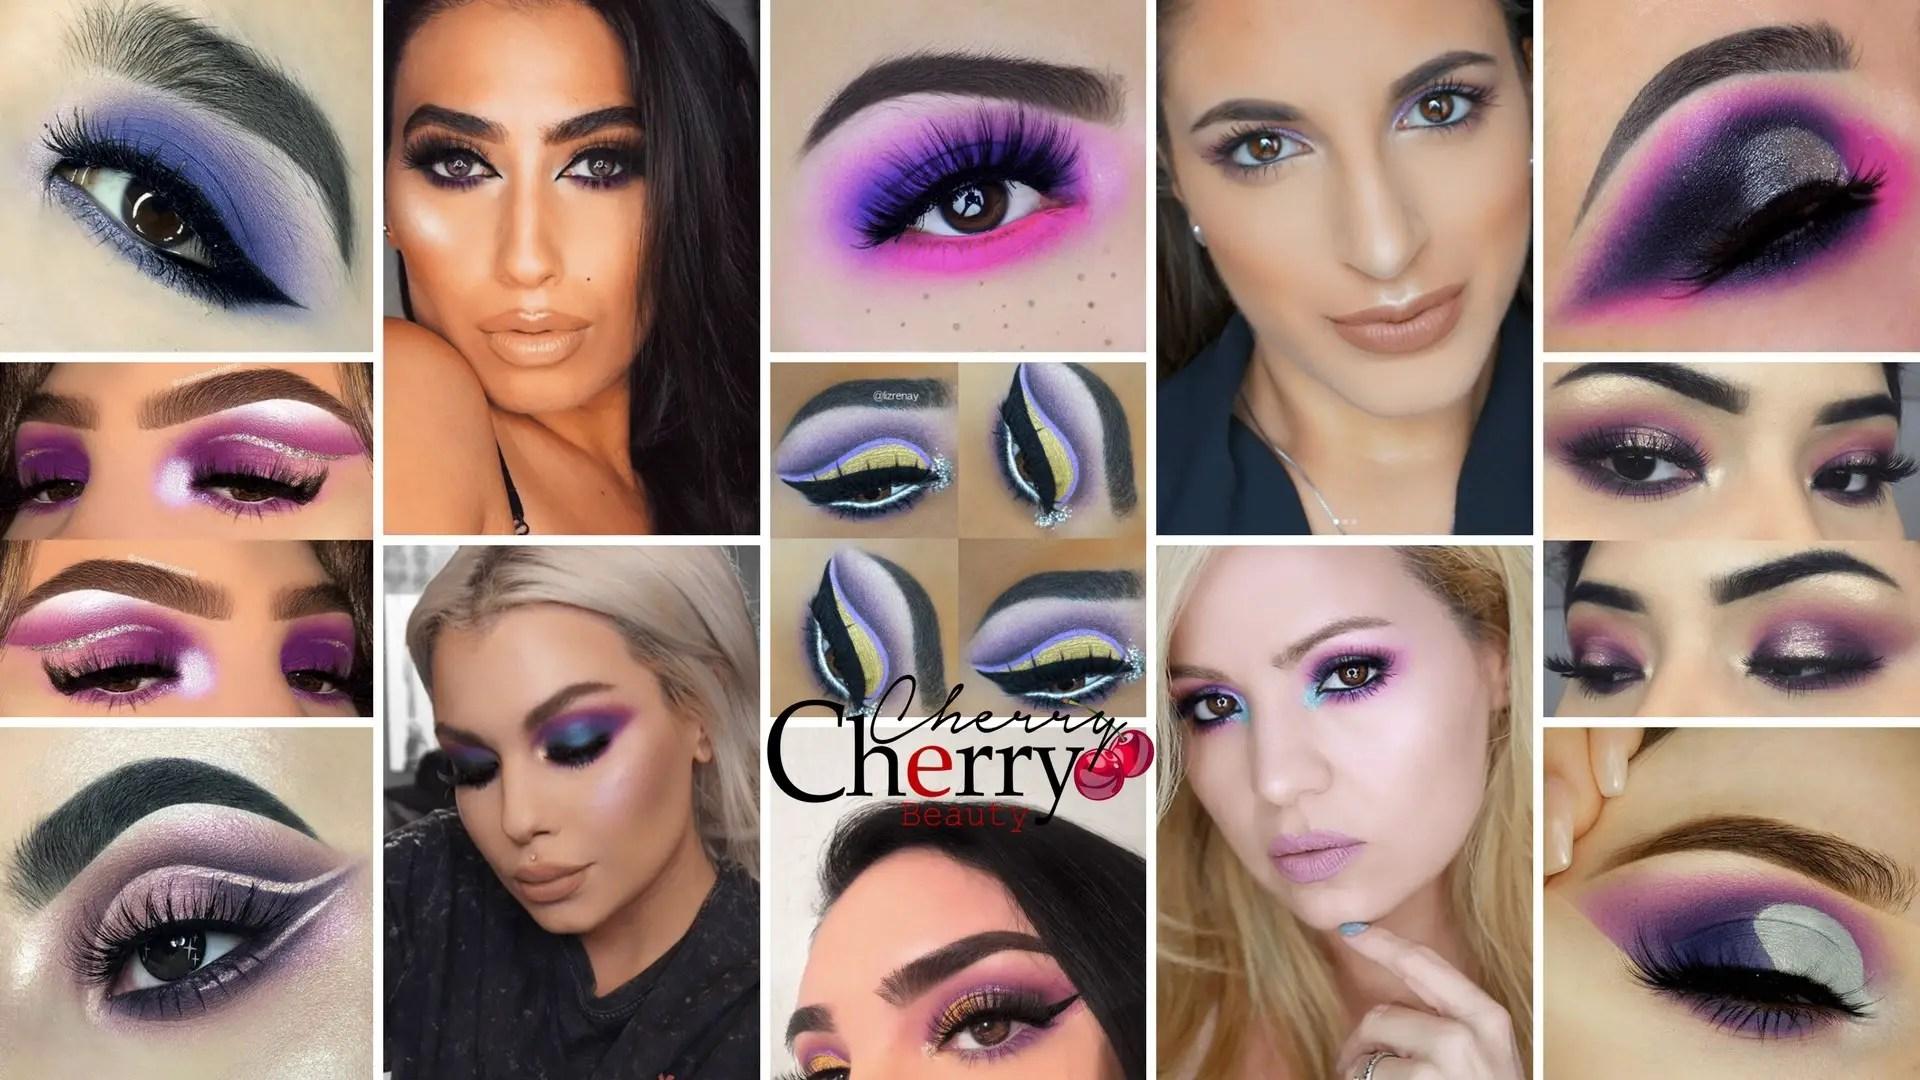 21 purple eyeshadow looks for brown eyes - cherrycherrybeauty